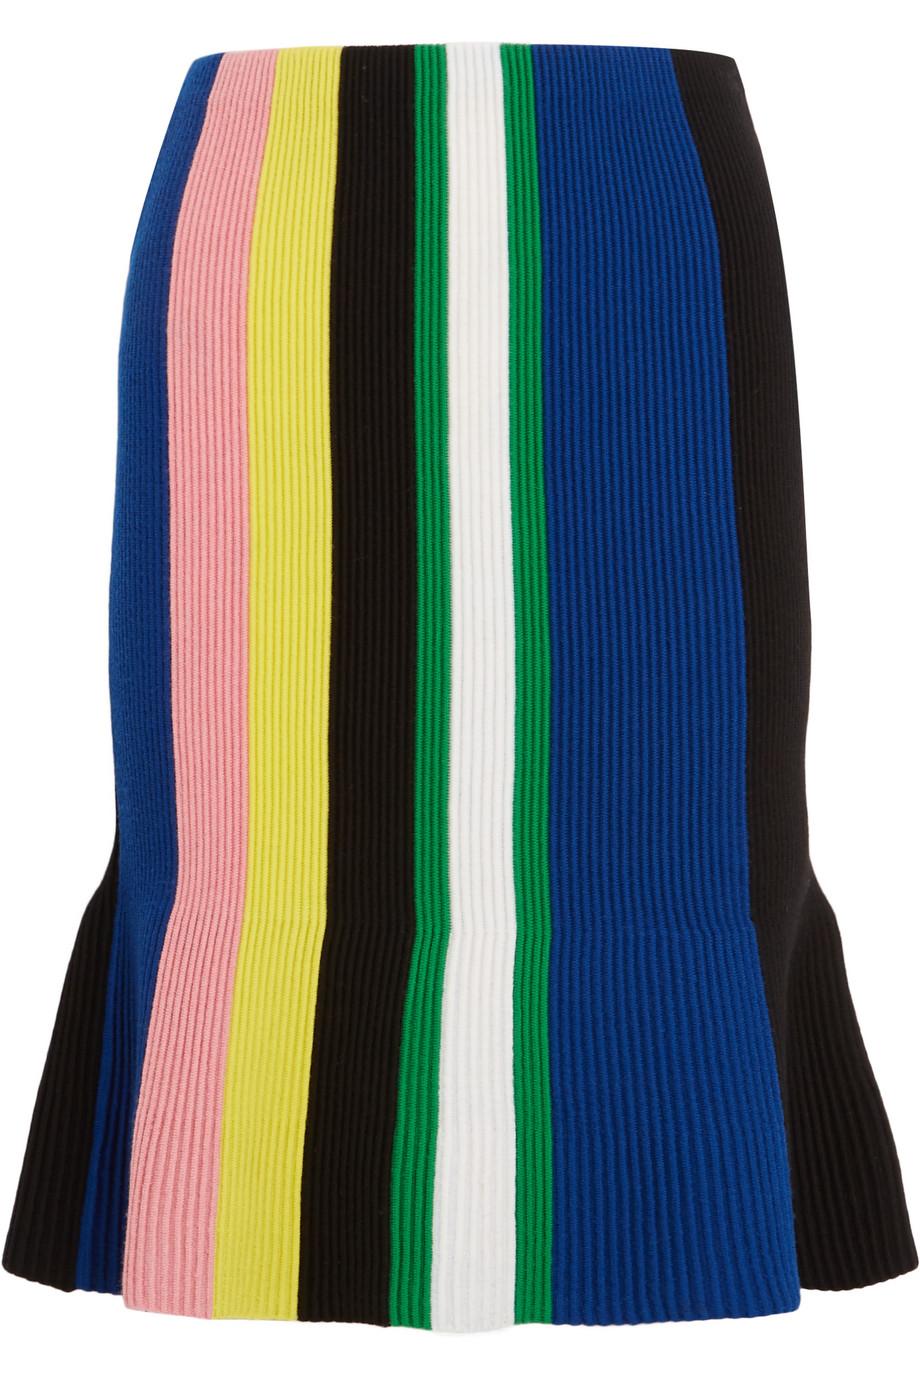 J.W.Anderson Striped Ribbed Merino Wool Skirt, Blue, Women's